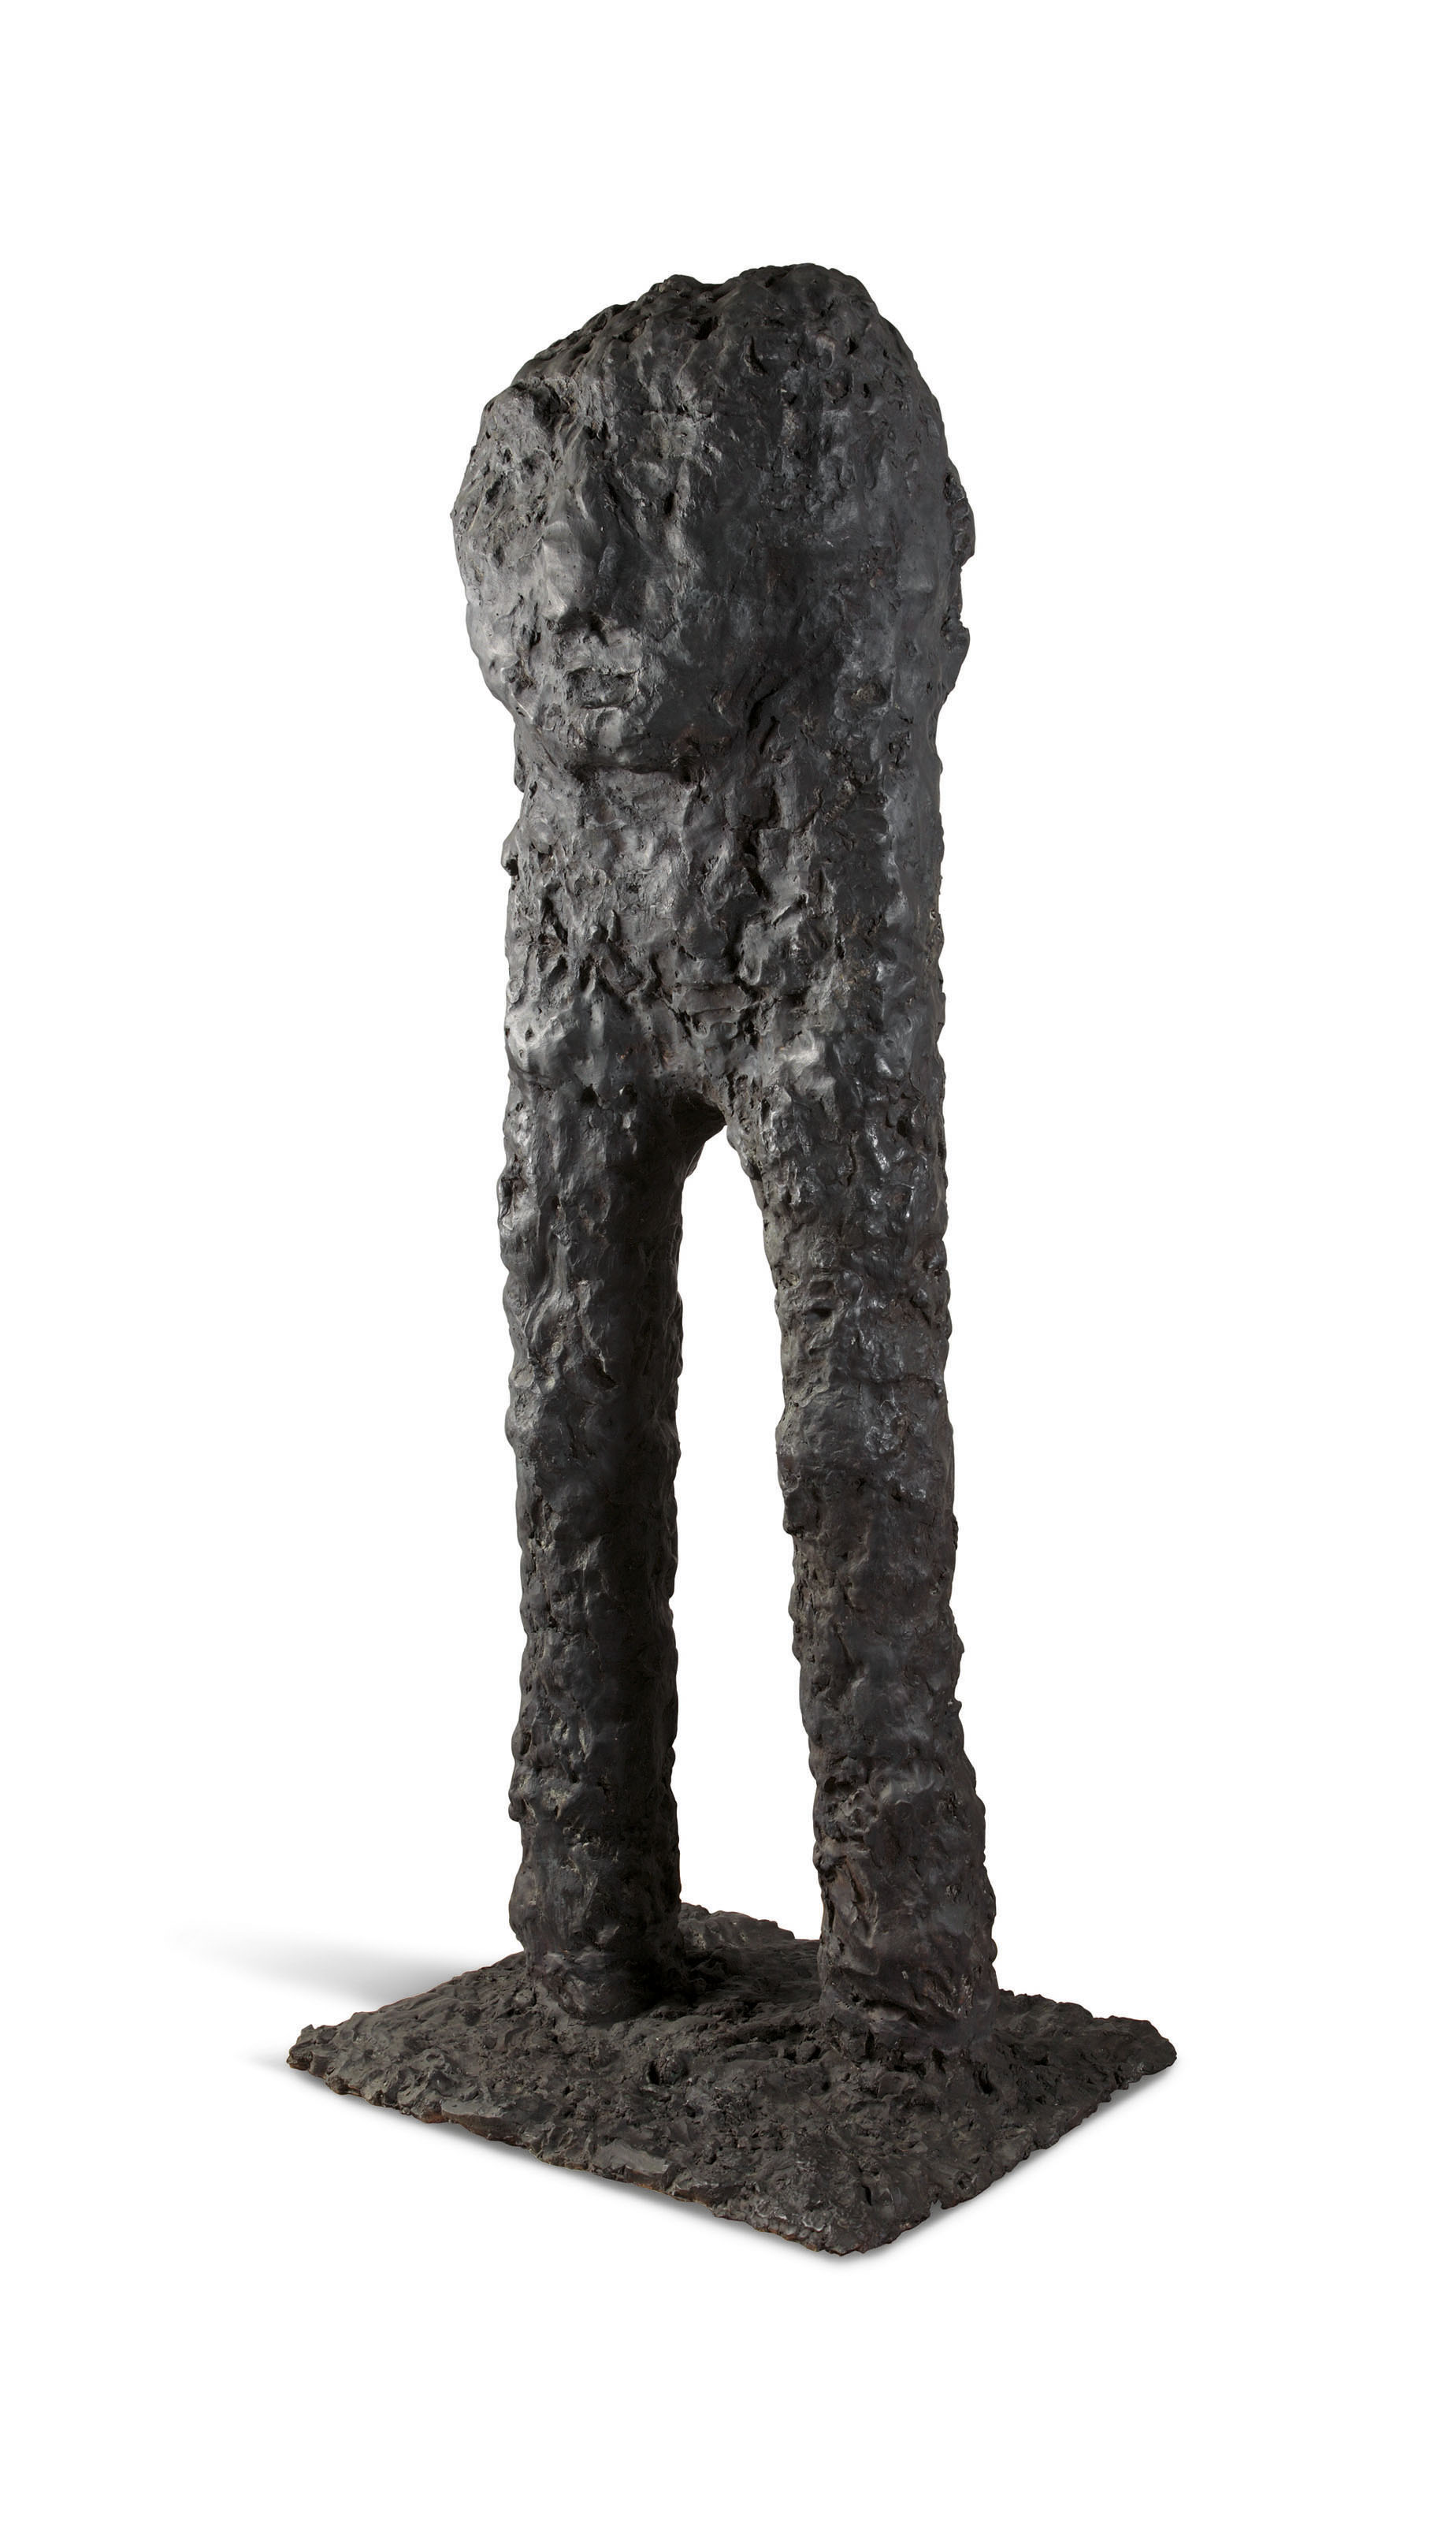 Gestalt (Figure)